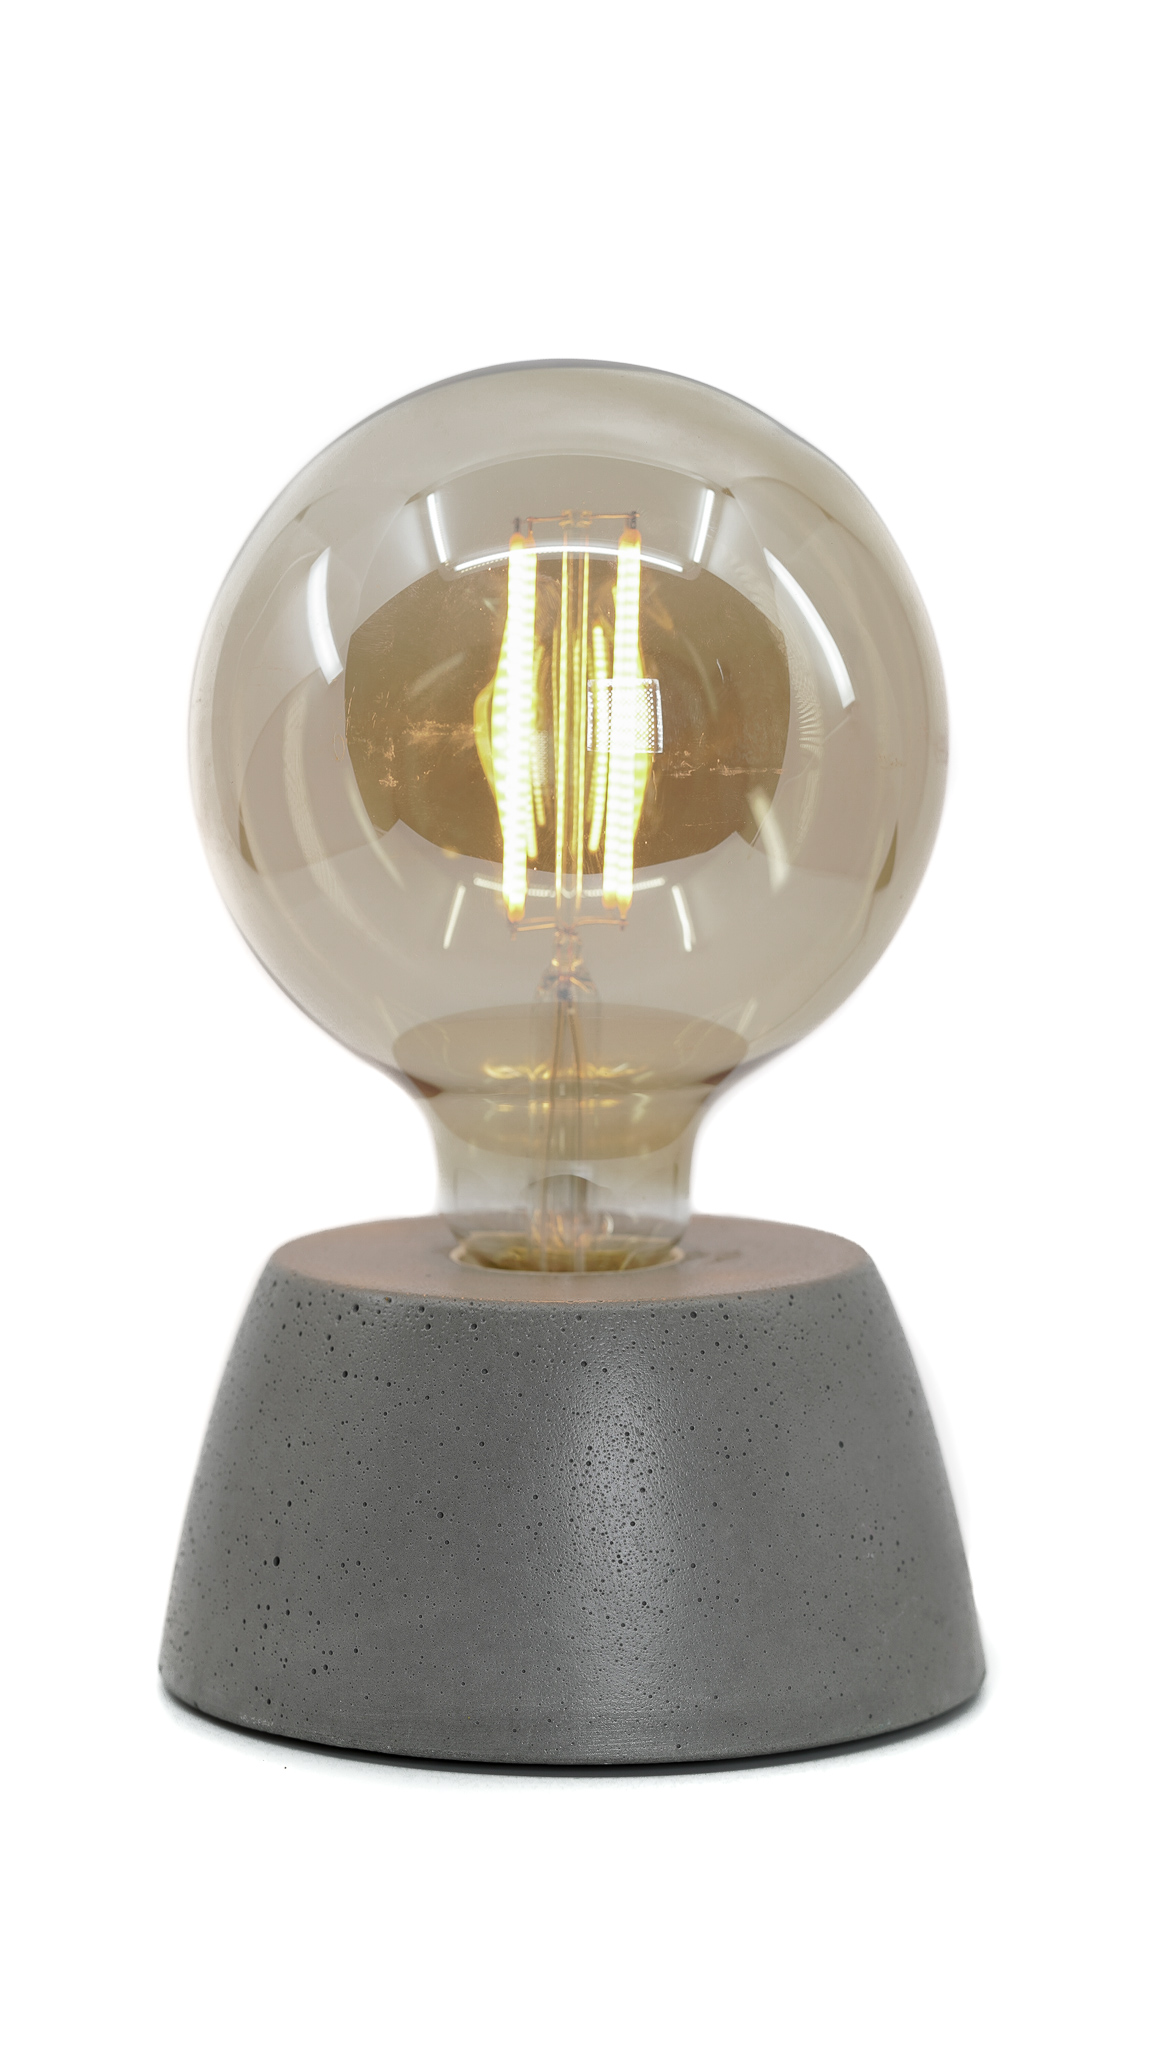 Lampe dôme en béton gris fabrication artisanale